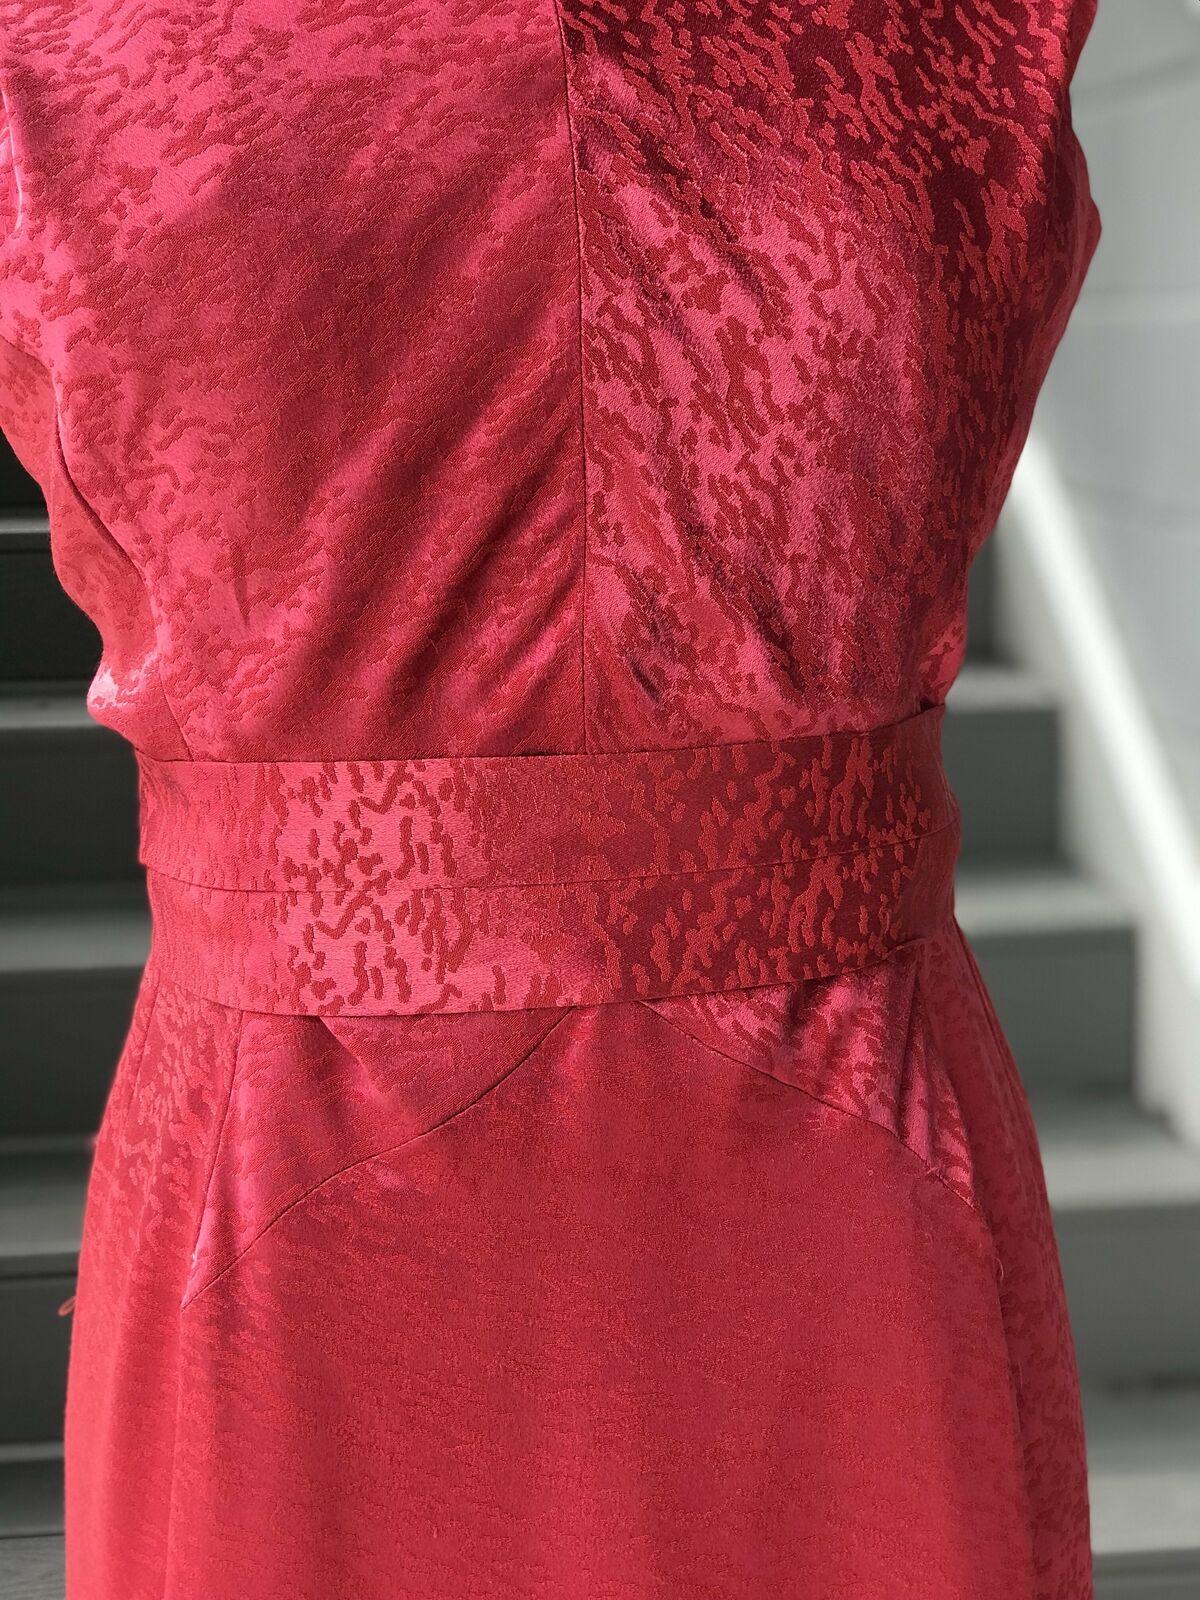 1950s Rasberry Jacquard Formal Dress + Belt - image 5